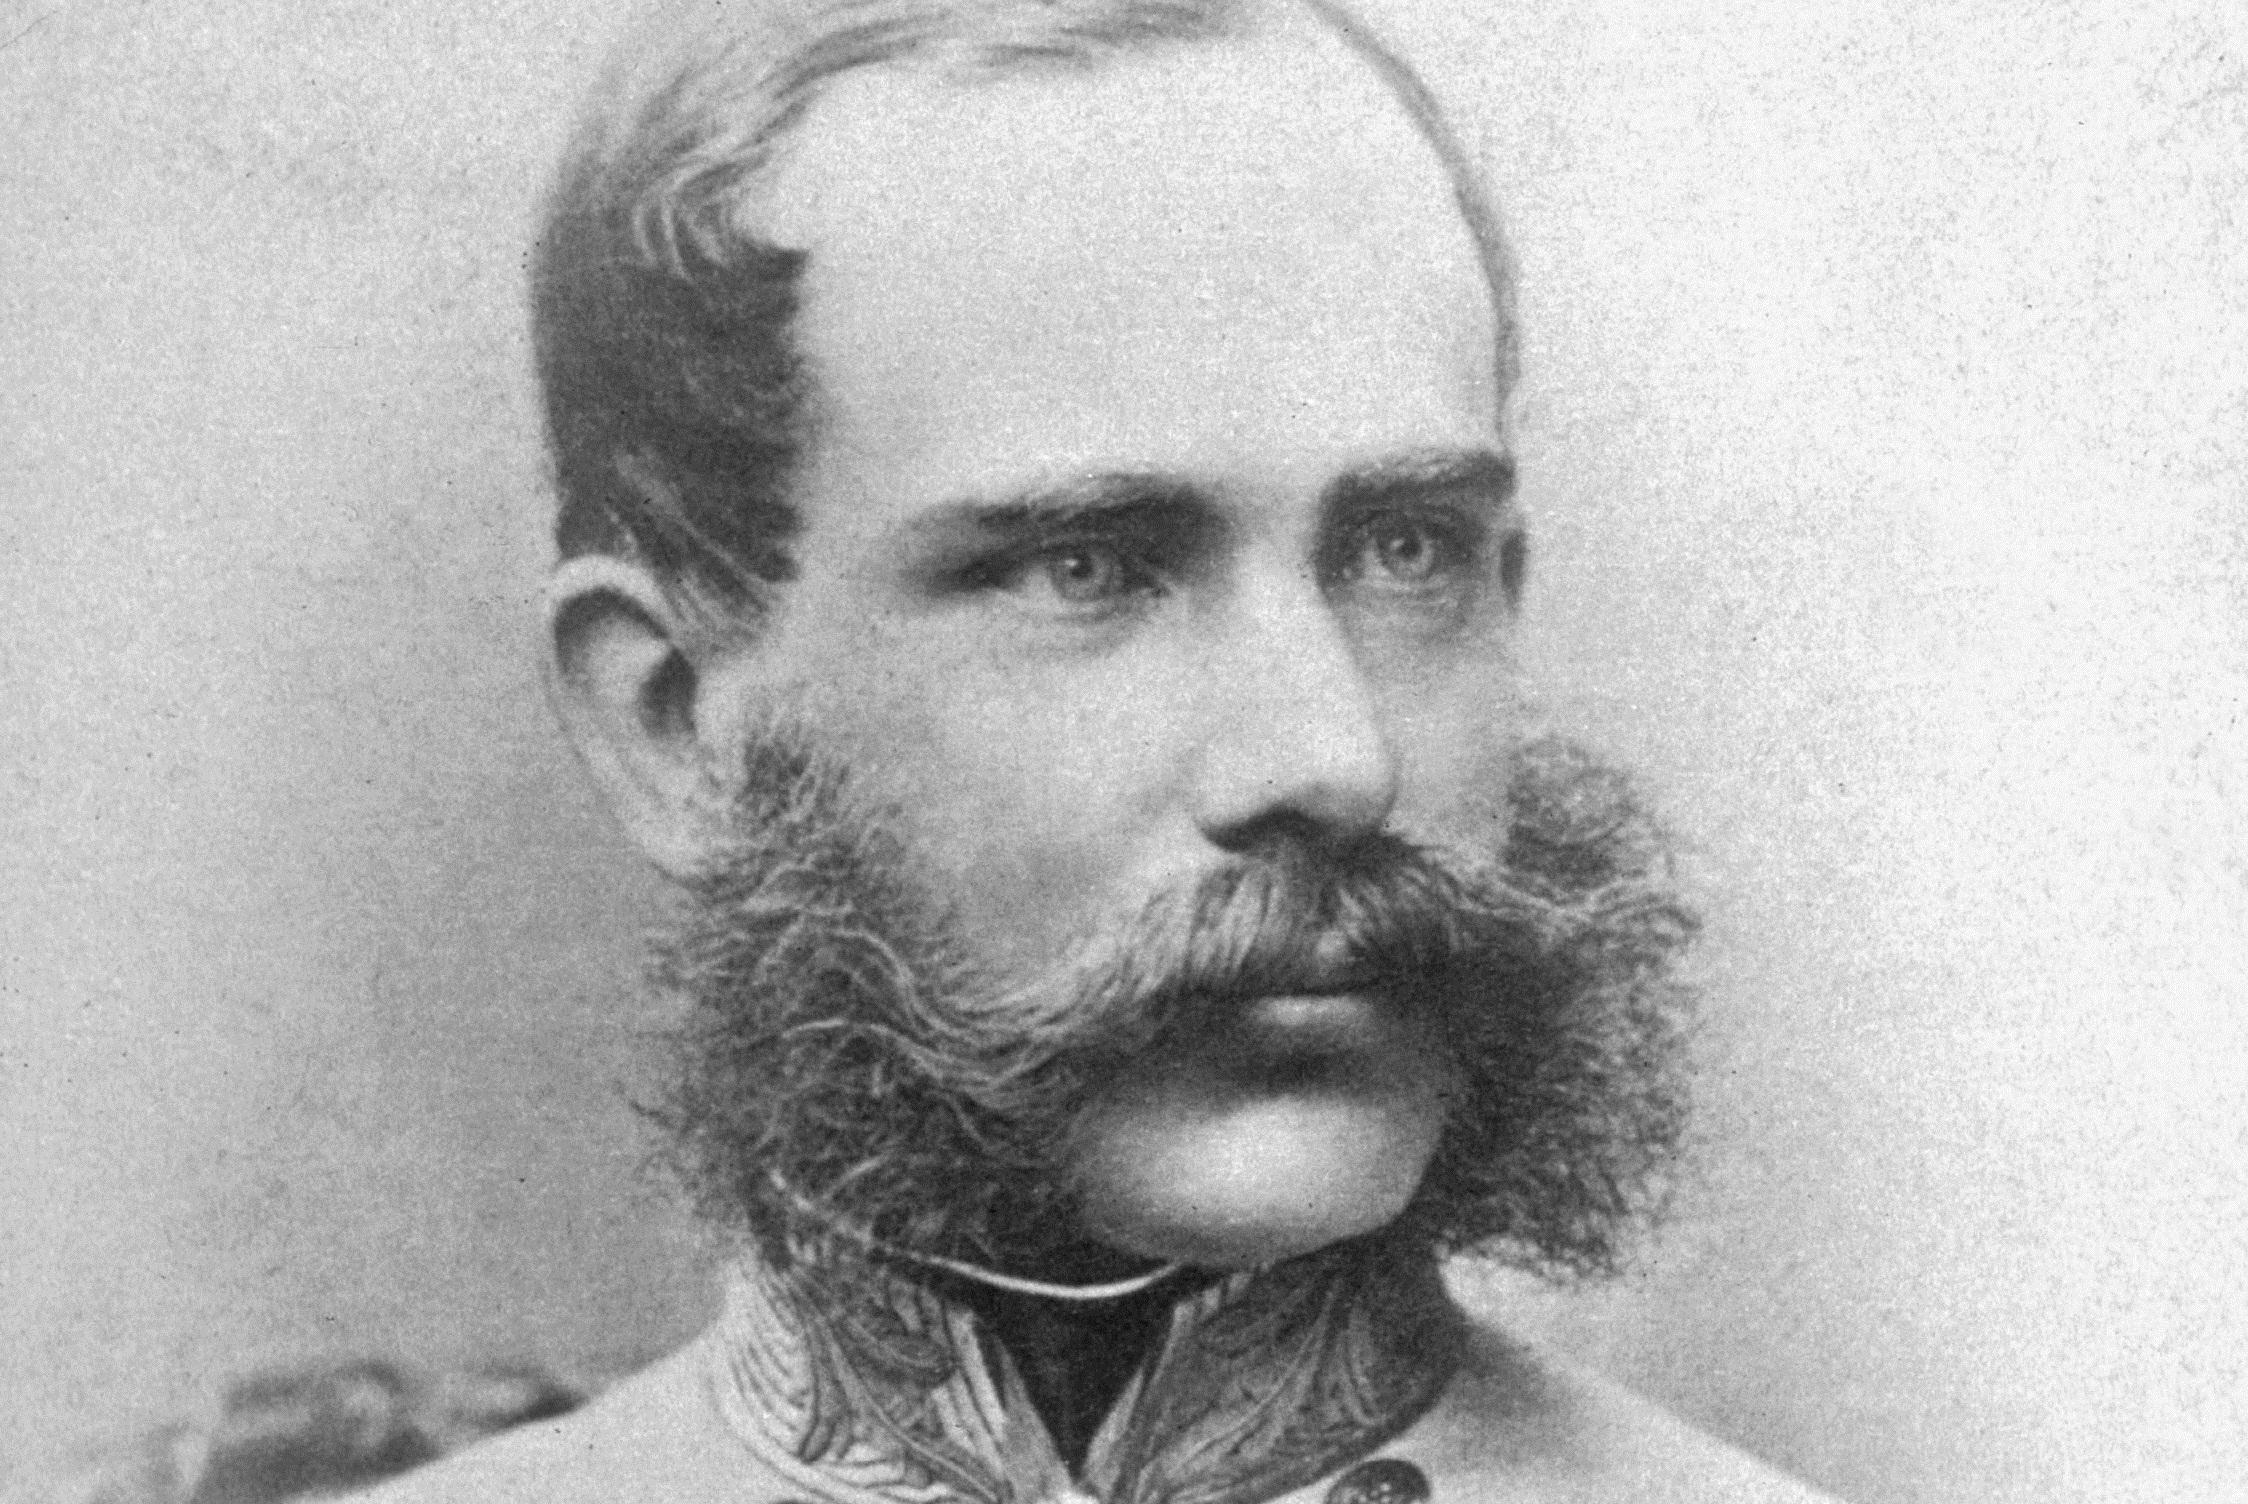 Franc Jozef I